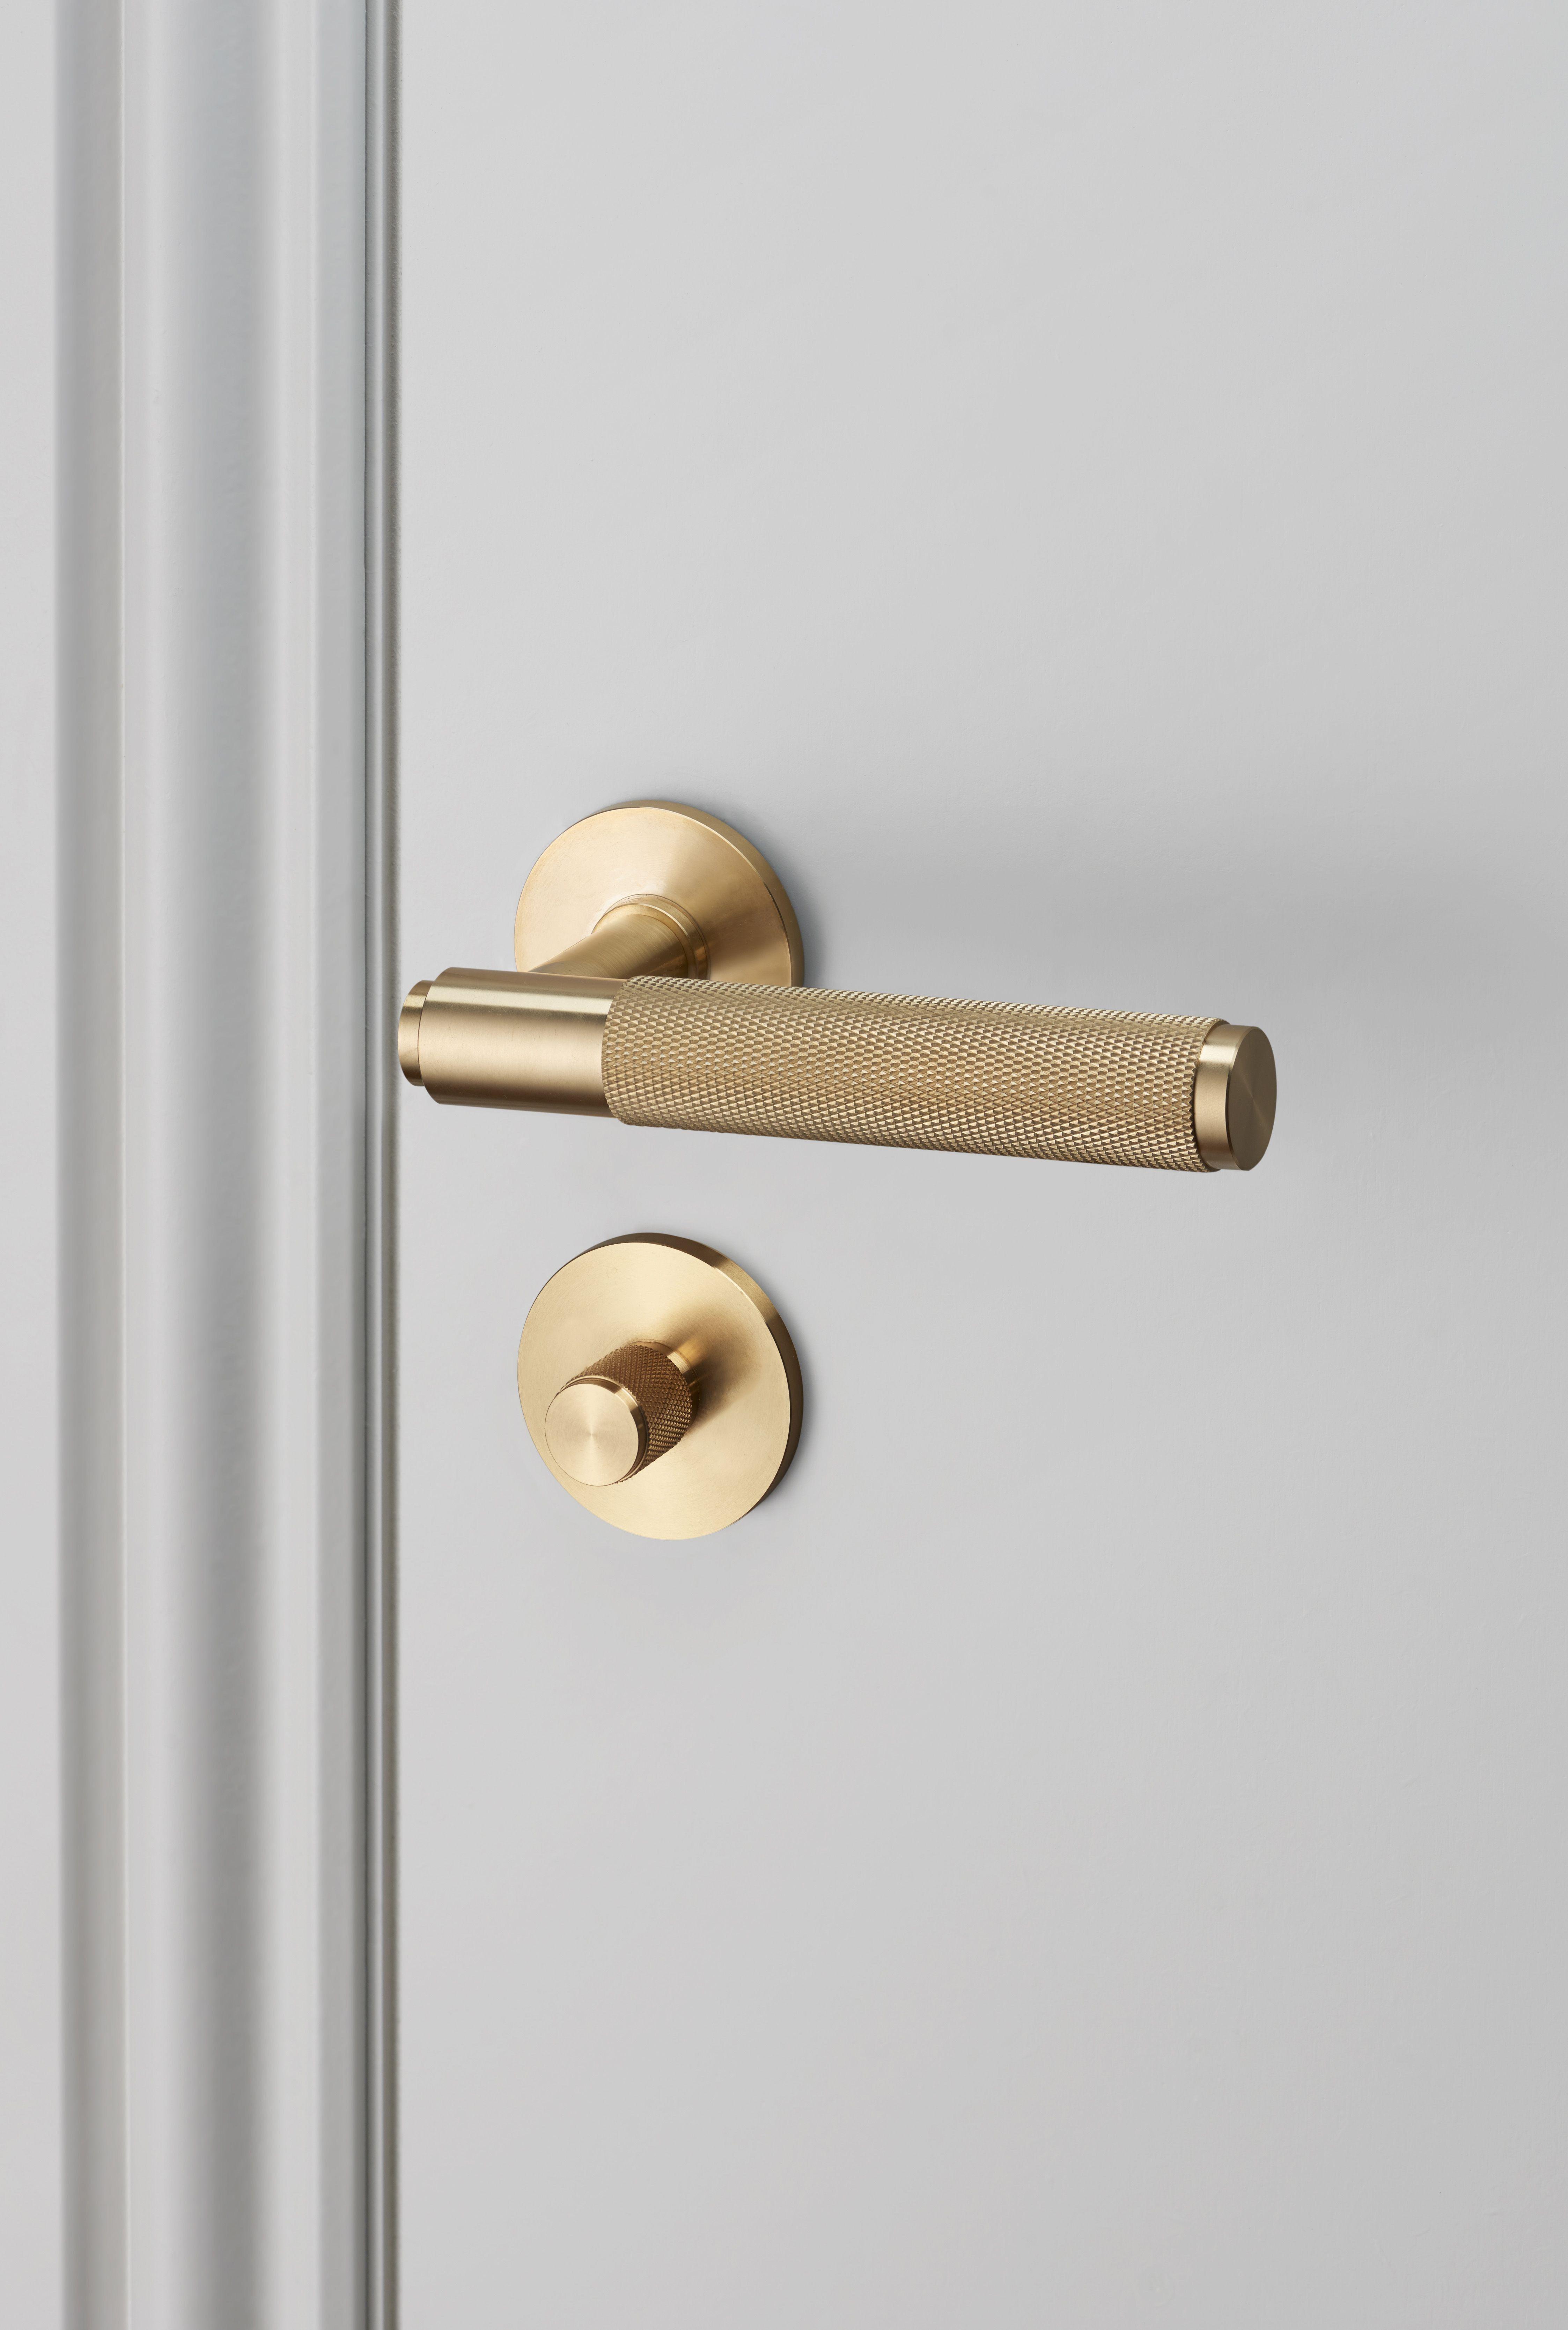 Elegant Crystal Lever Door Handles Check More At  Https://homefurnitureone.com/